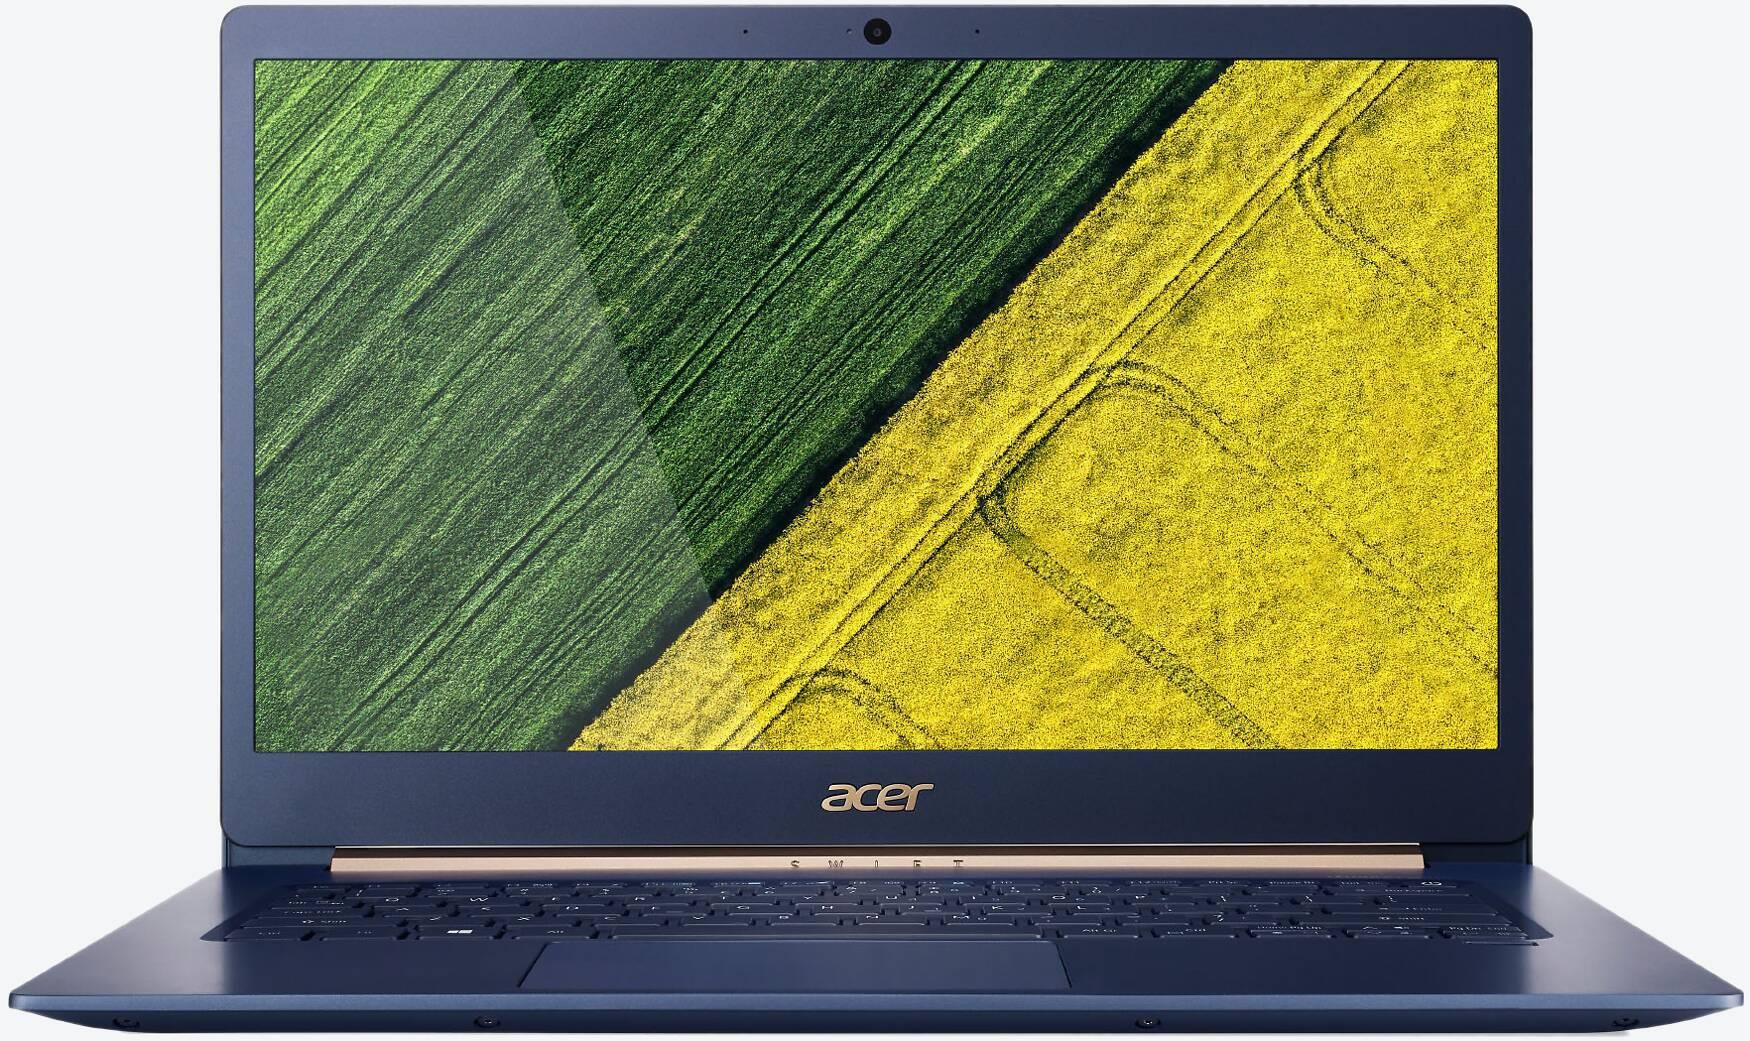 Acer Swift 5 SF514-54T-501U Blau